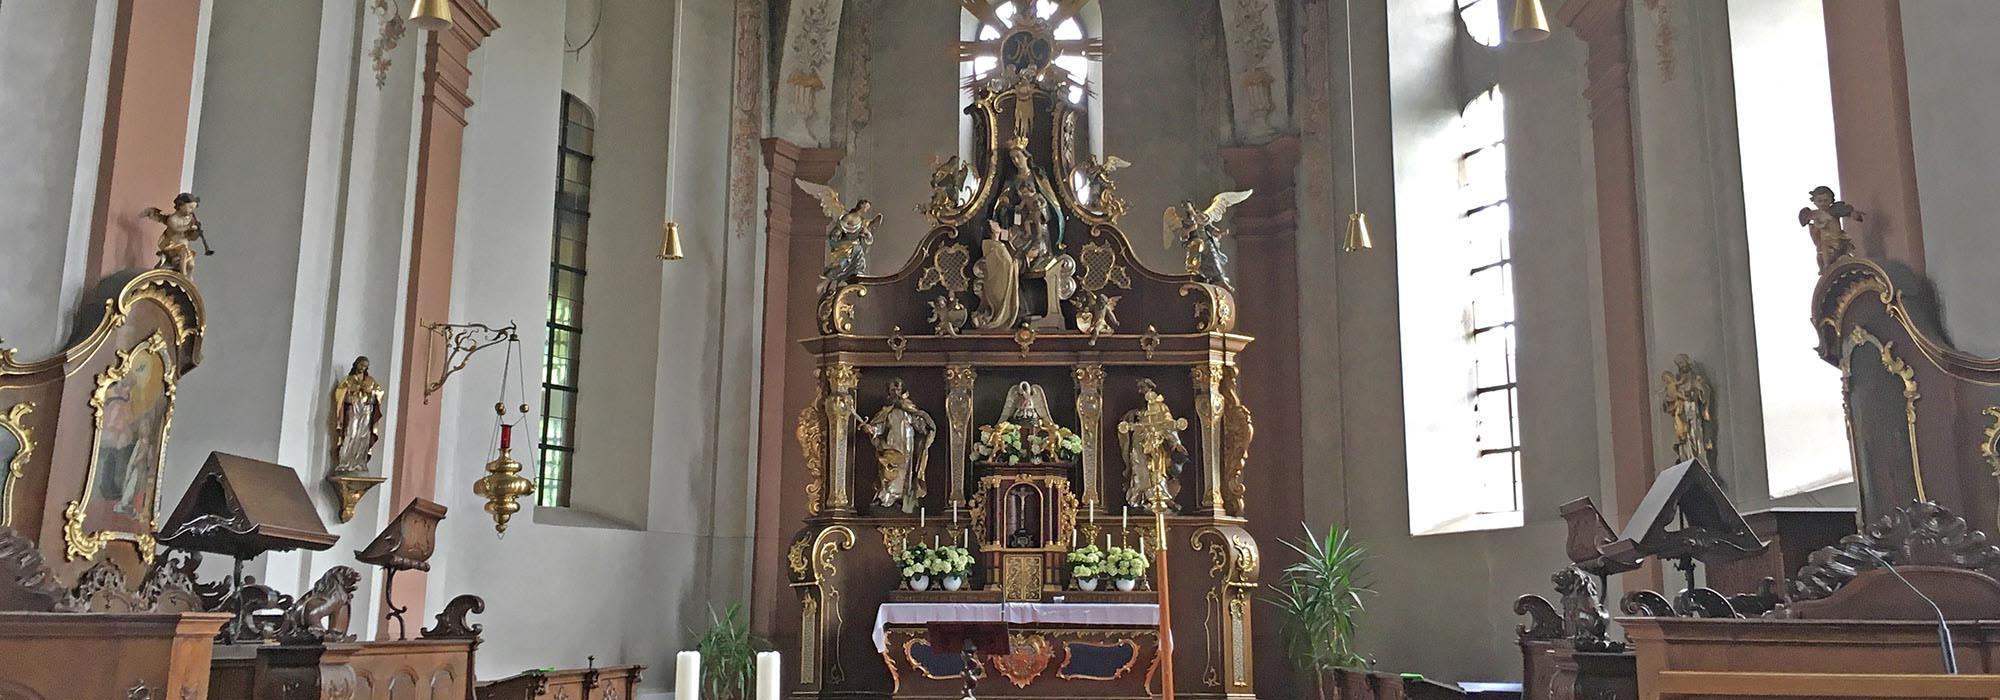 Springiersbach-IMG_1584